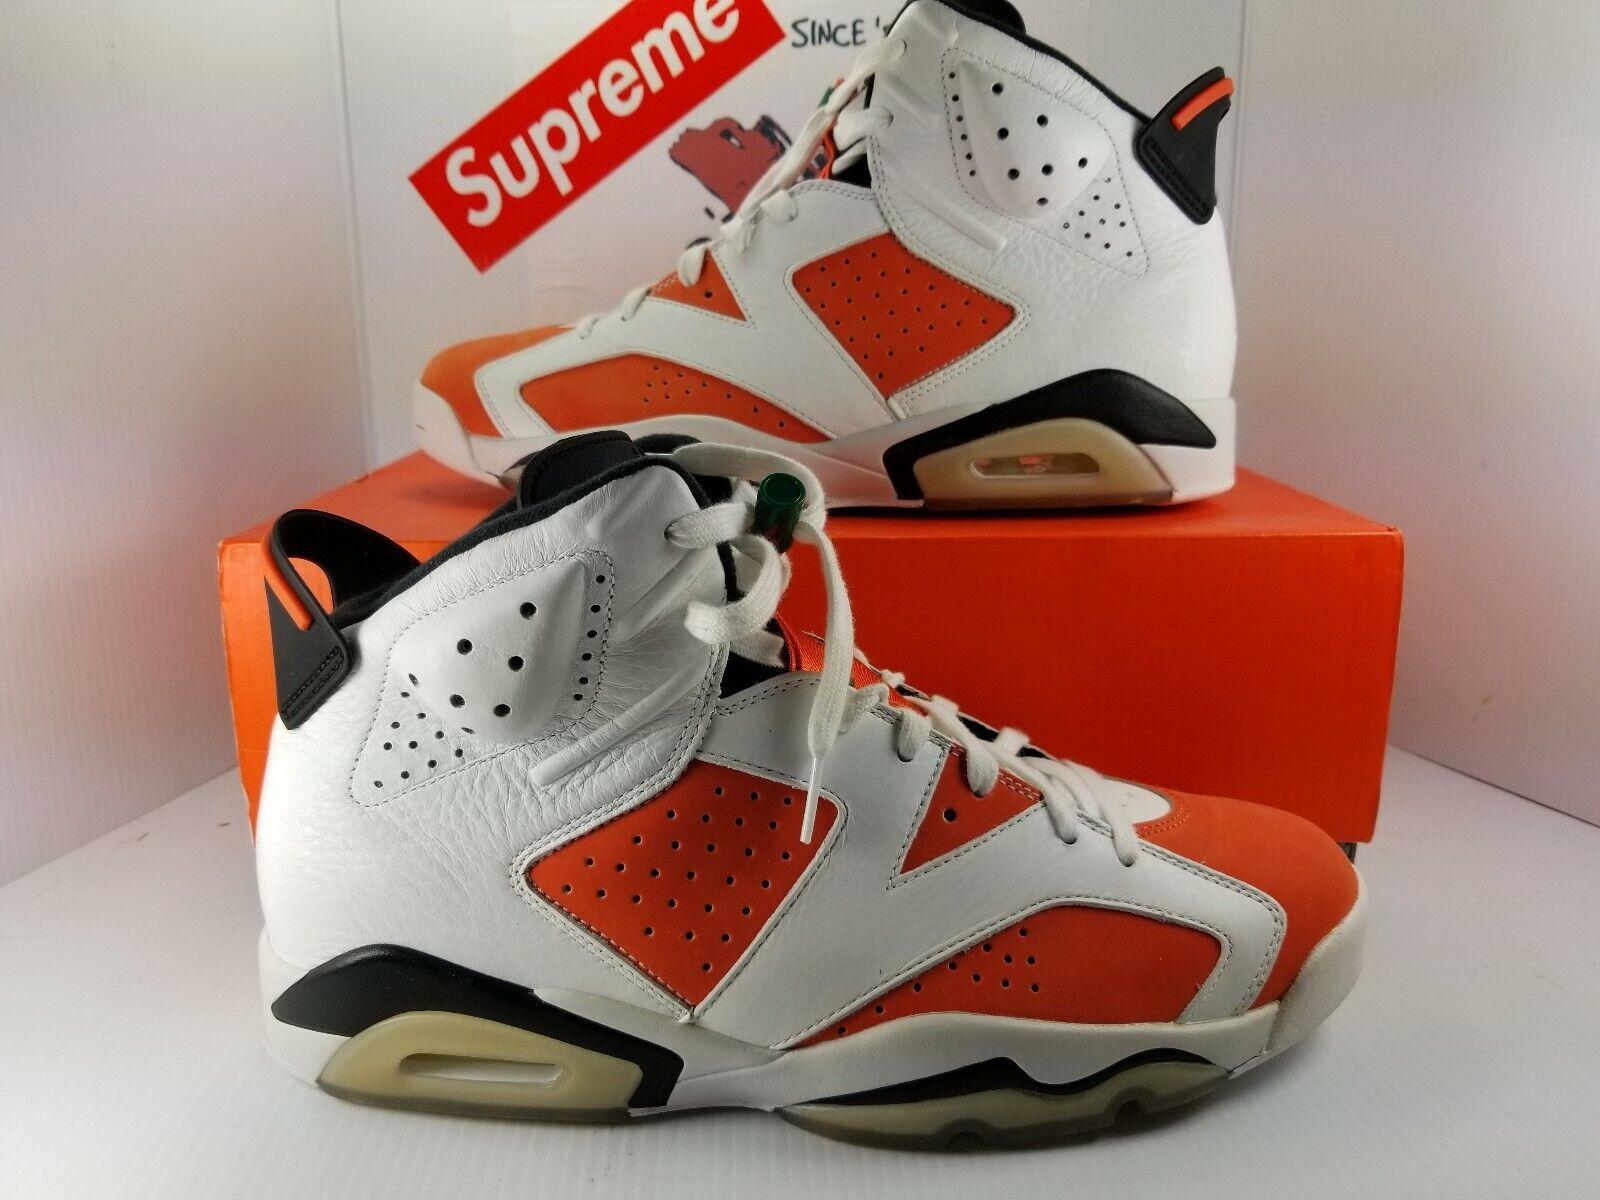 Nike Air Jordan 6 Retro 'Gatorade' 384664-145 Size 11.5 NEW